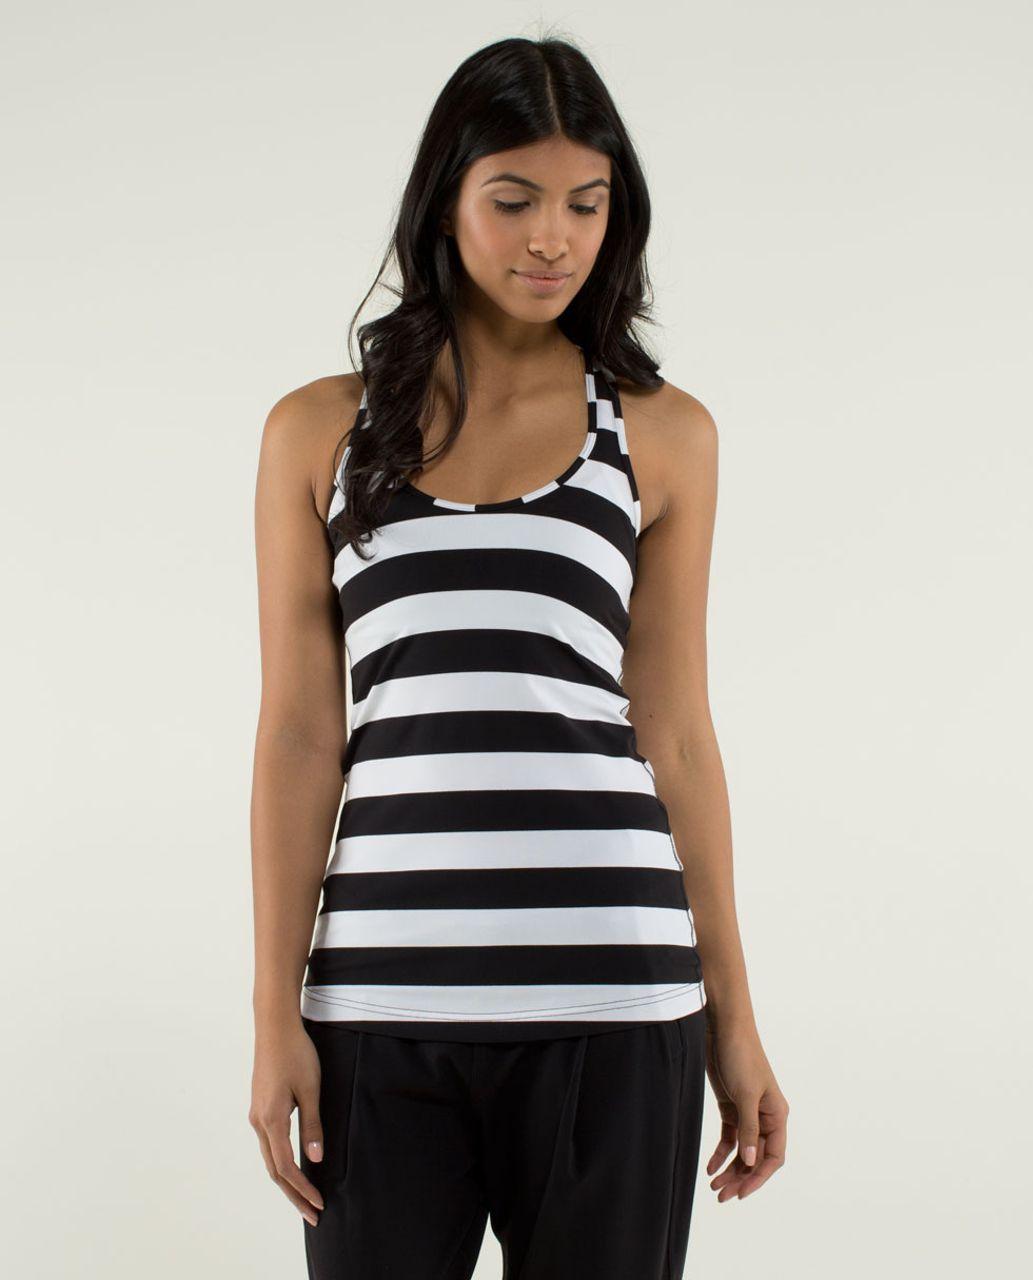 Lululemon Cool Racerback - Straightup Stripe Black White